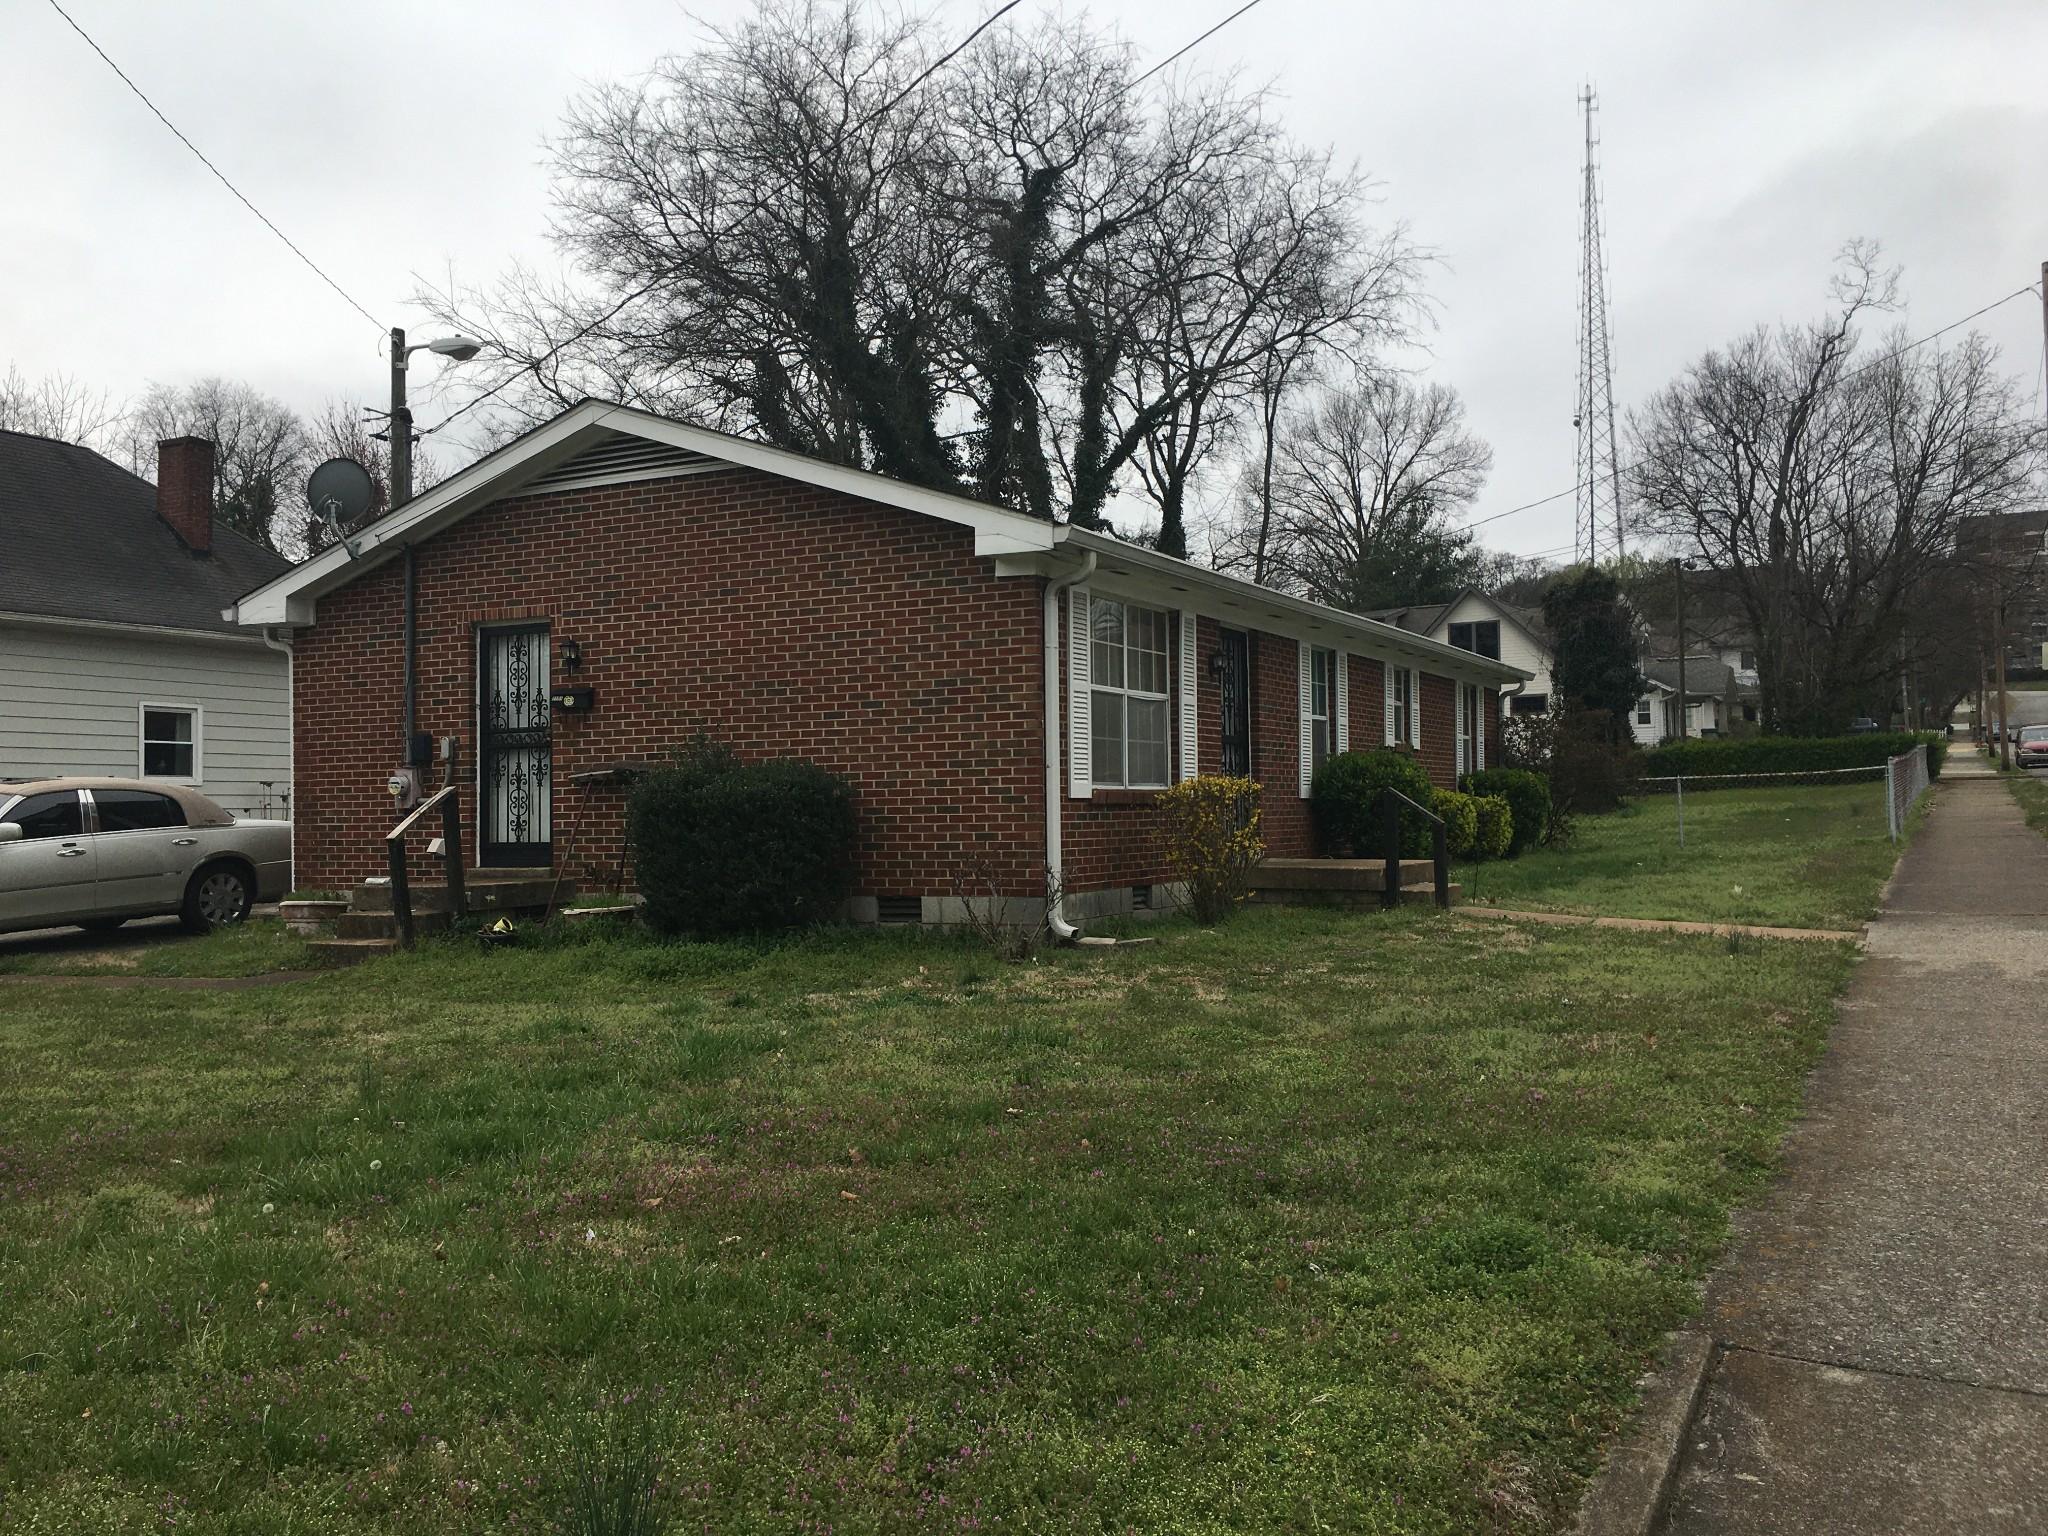 2101 10th Ave, S, Nashville, TN 37204 - Nashville, TN real estate listing